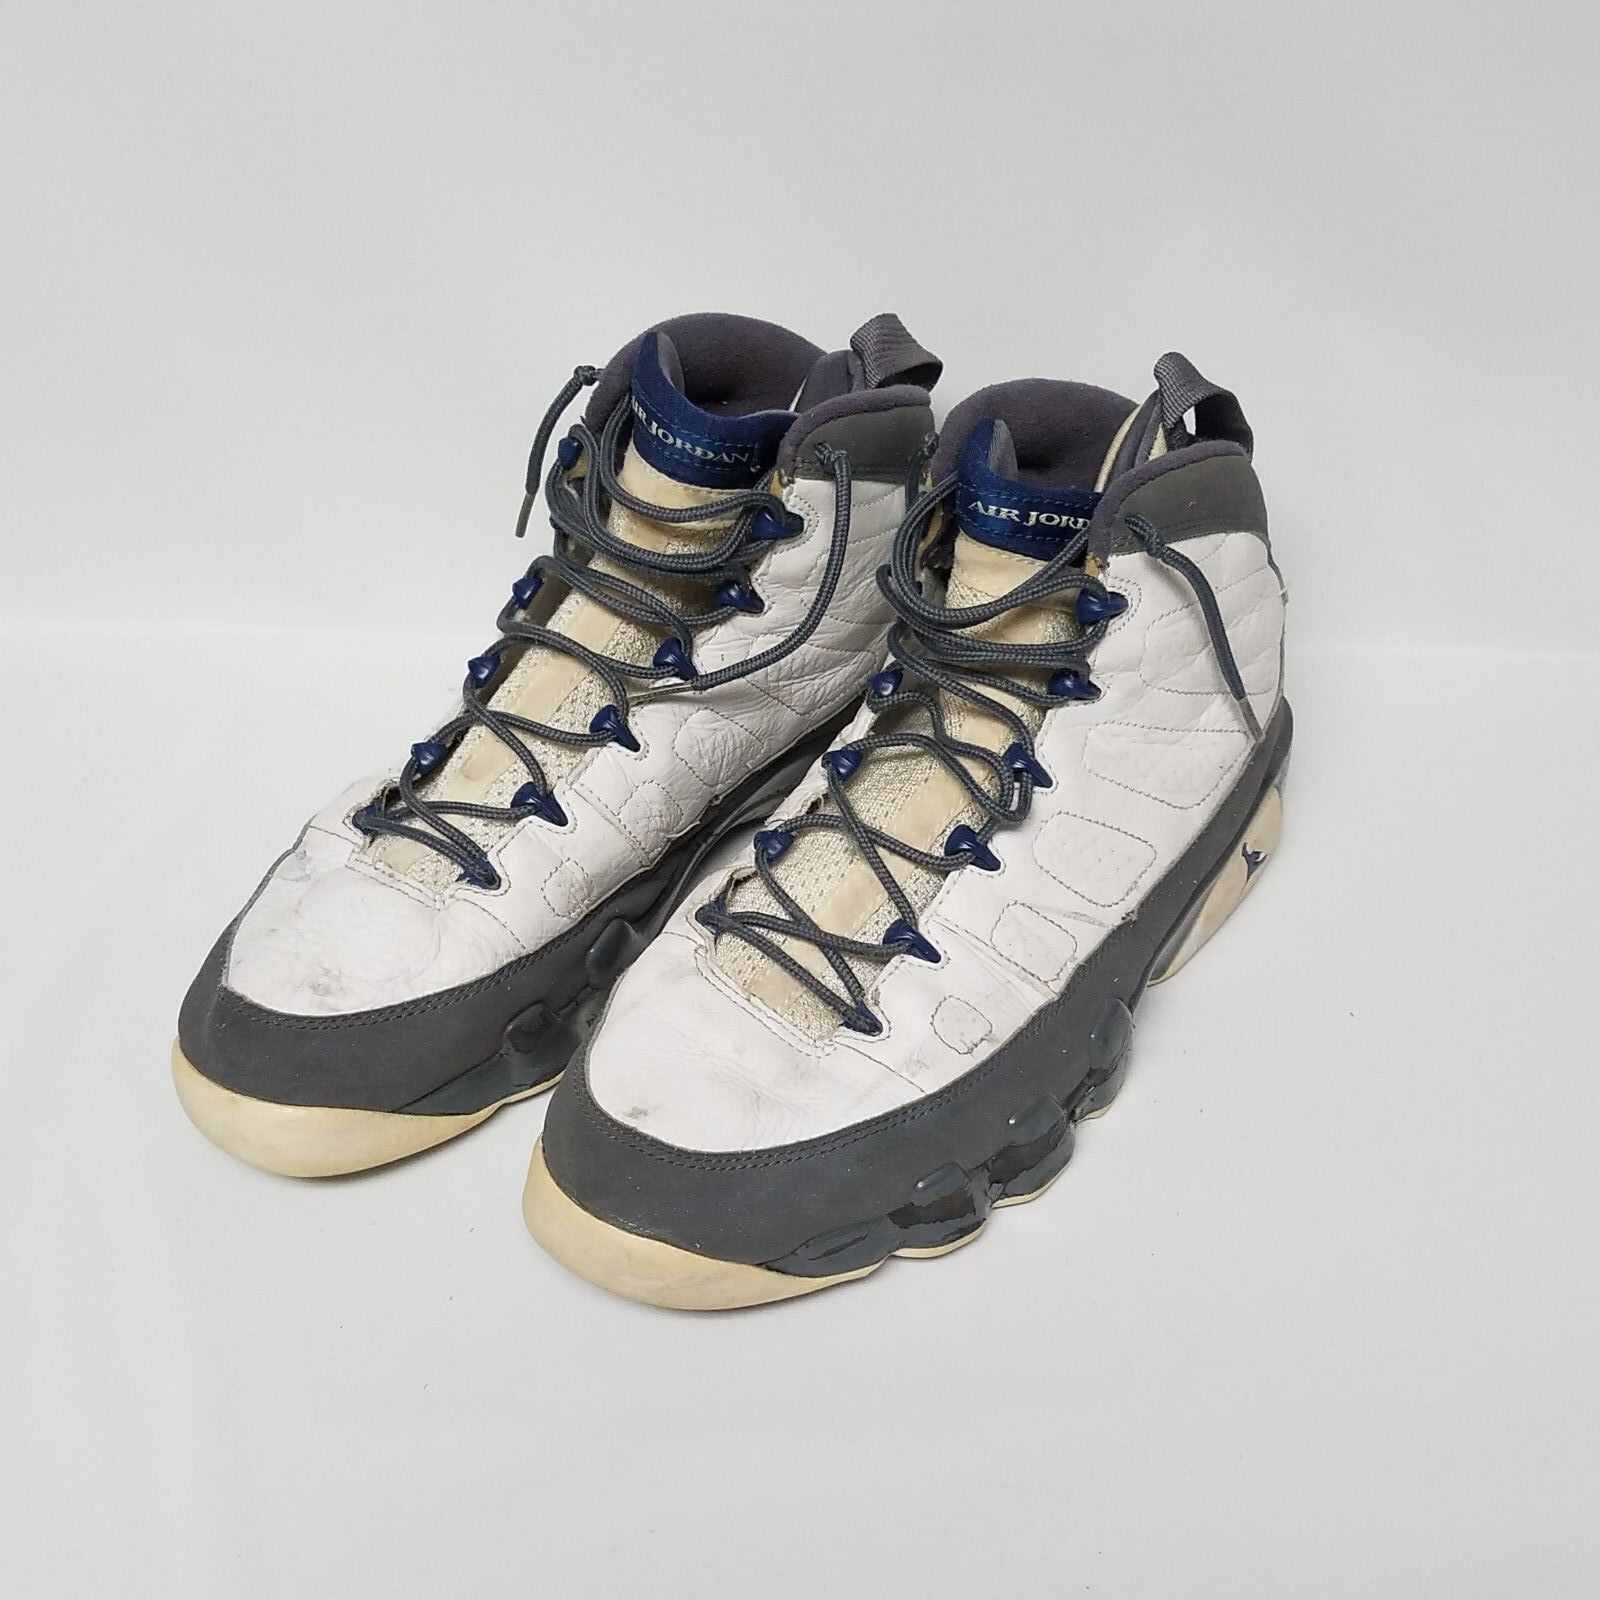 Nike air jordan 9 ix retro bianco blu, scarpe 302370-141 francese flint gray dimensioni 13